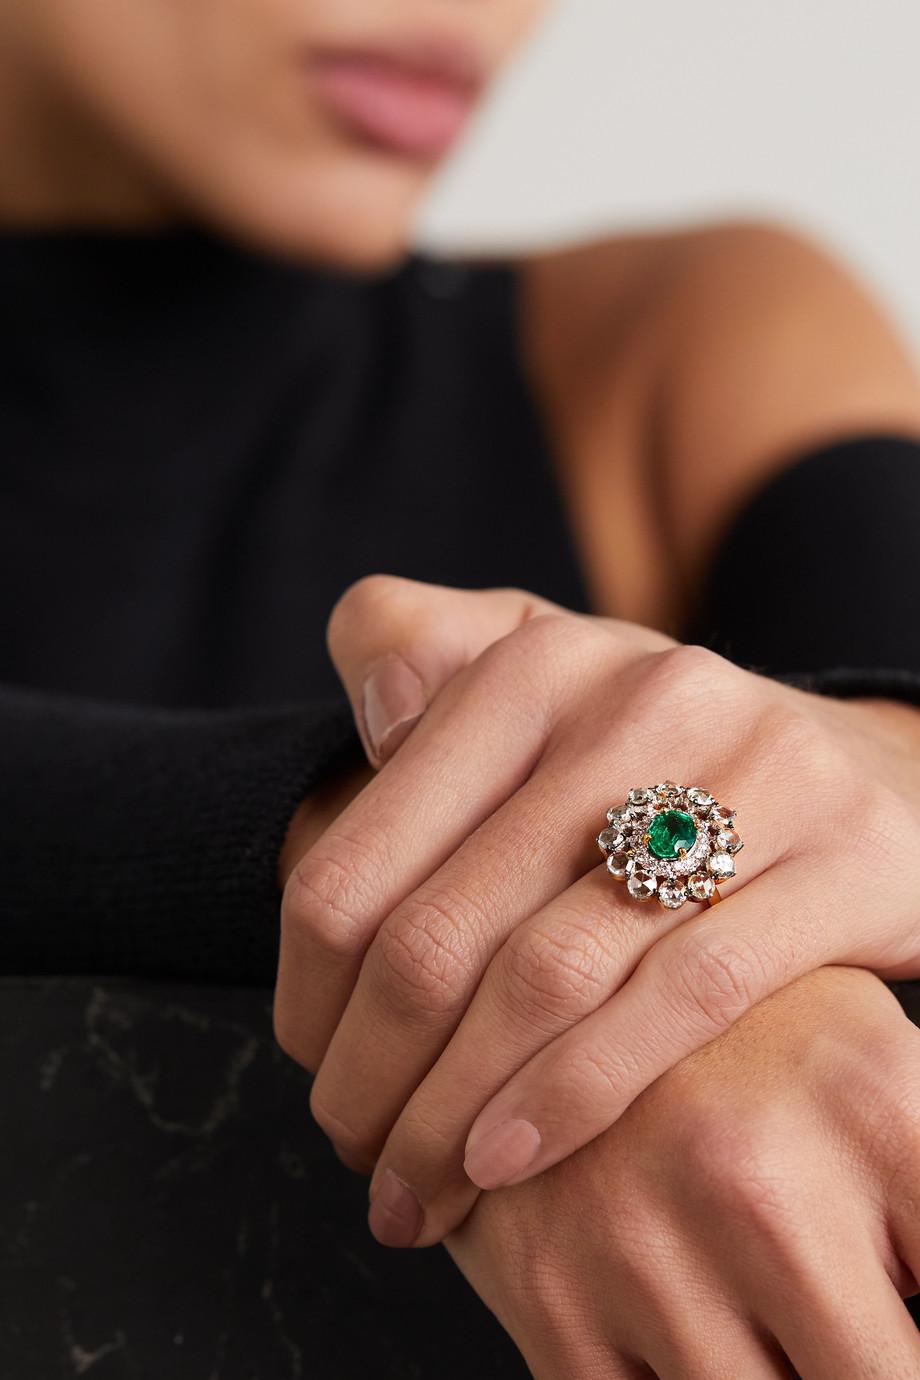 Amrapali 18-karat gold, diamond and emerald ring